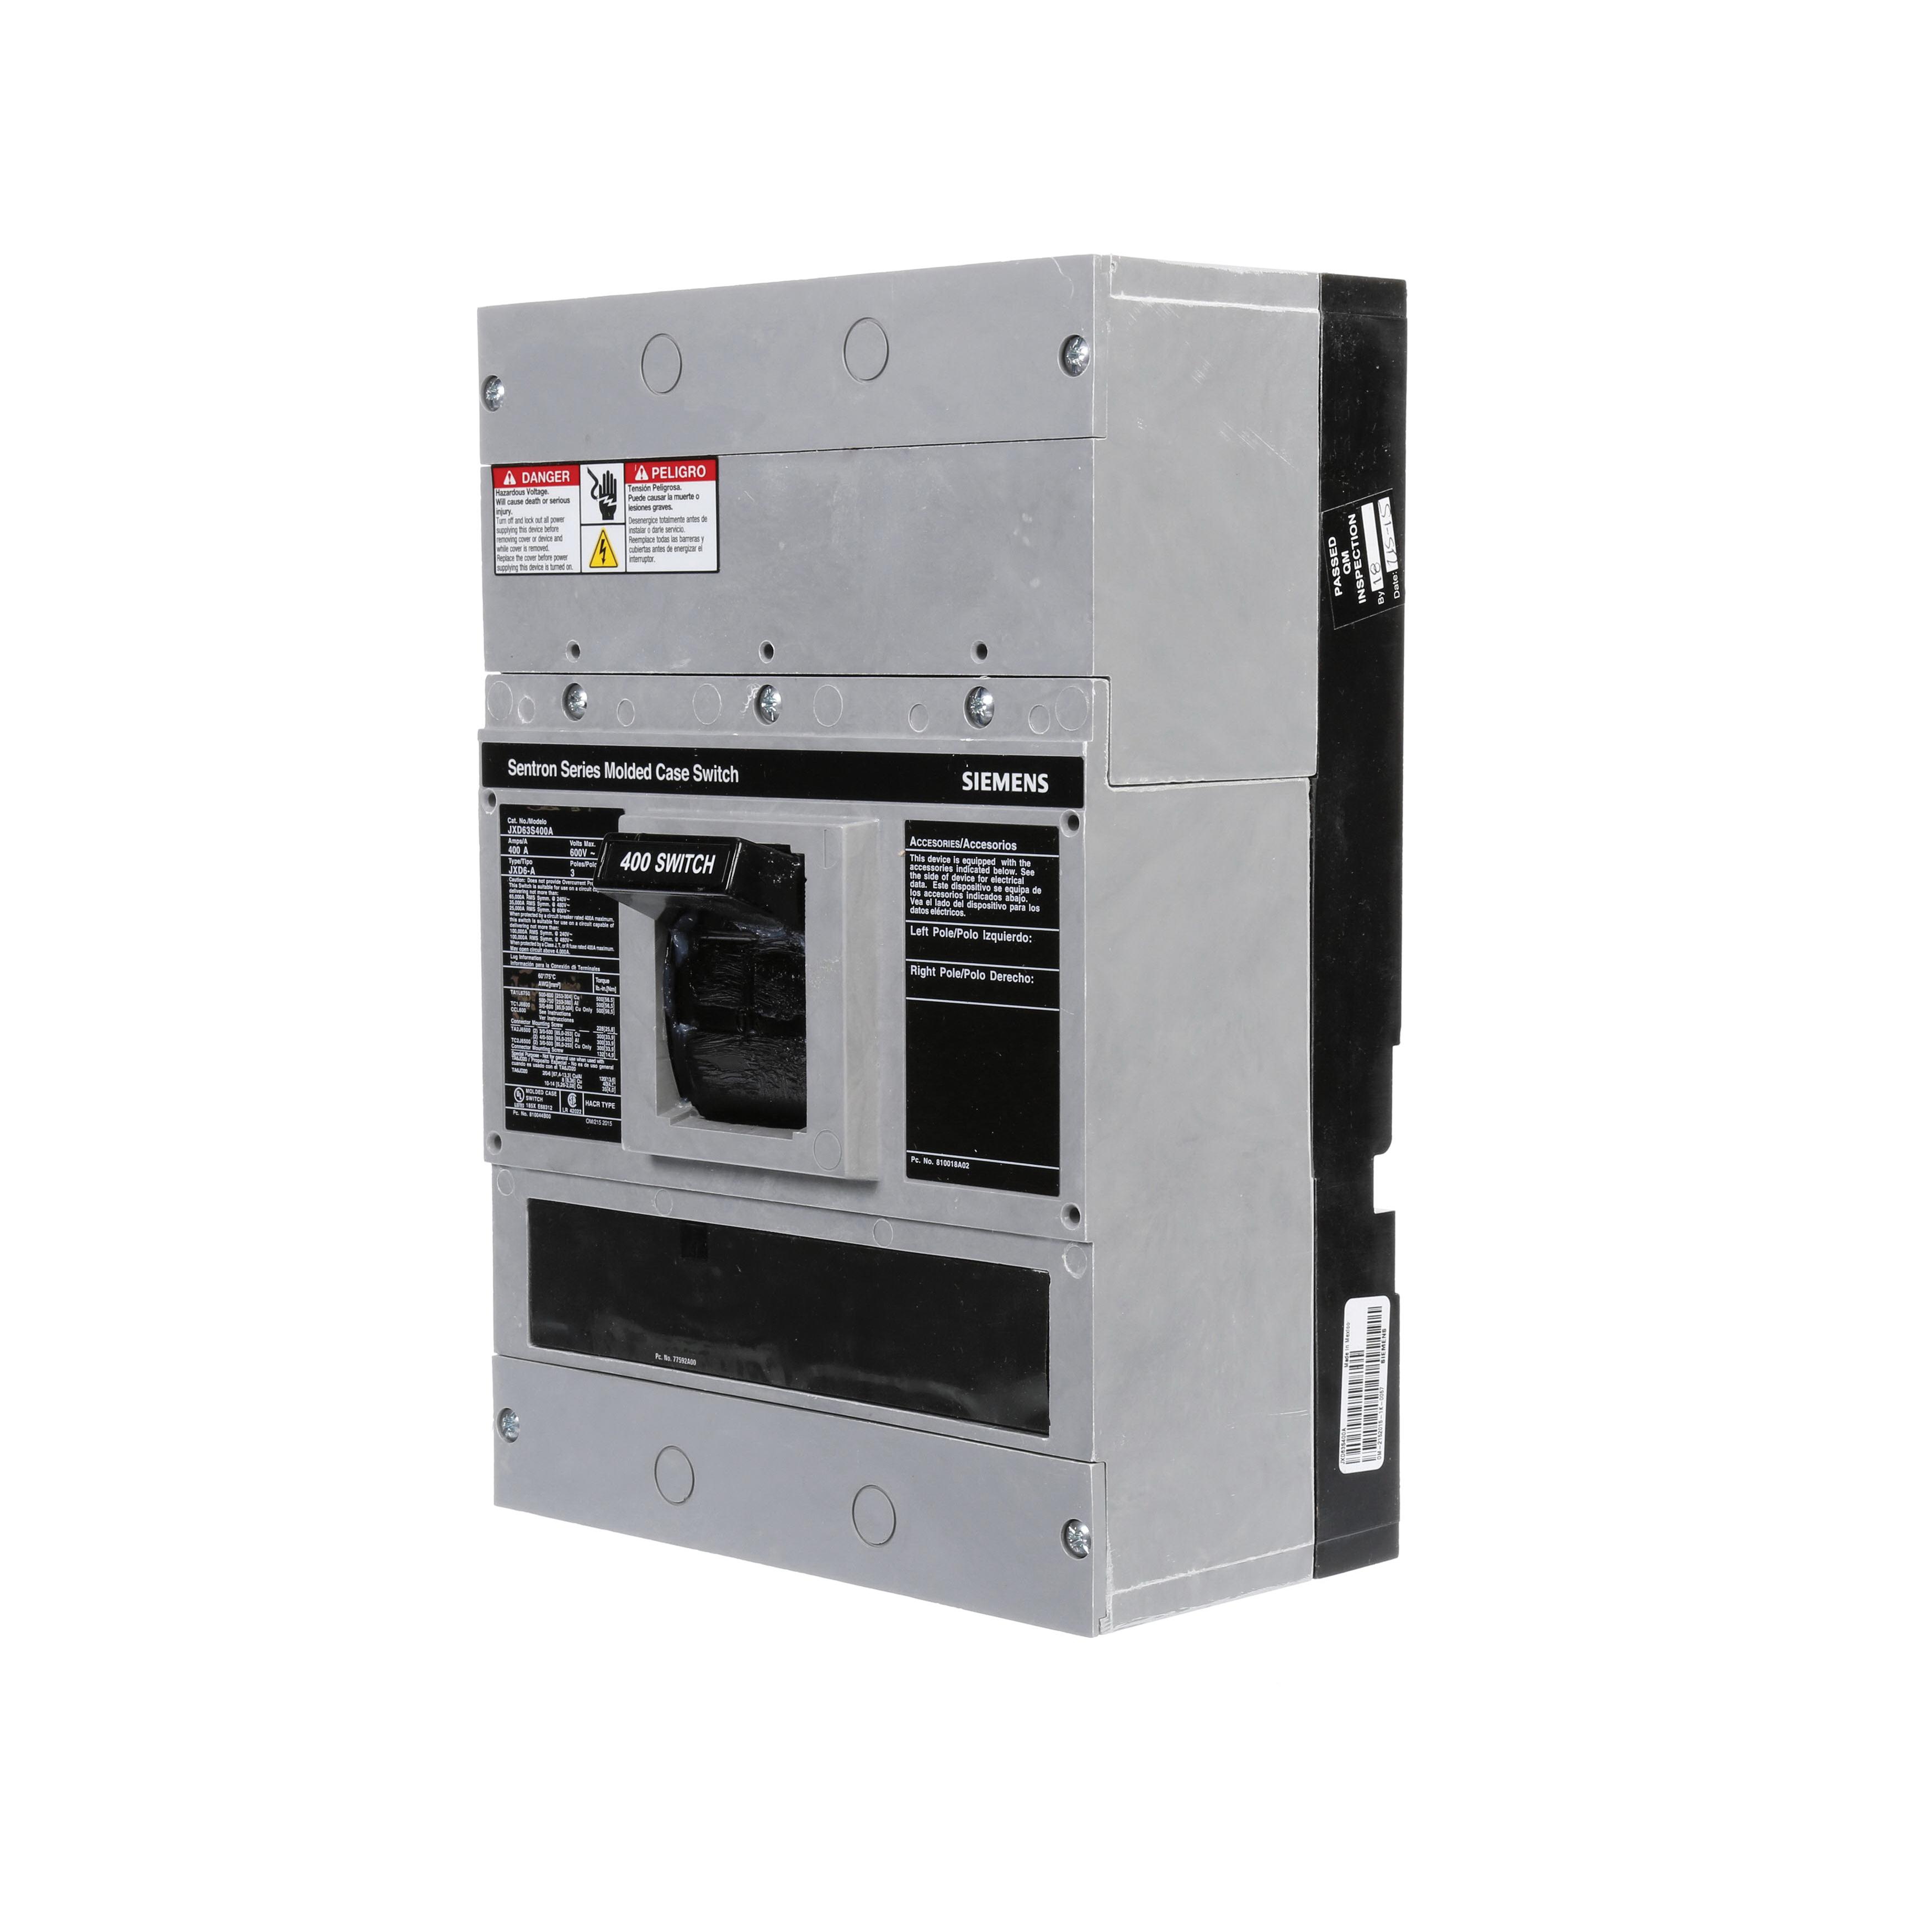 BREAKER JD 3P 400A 600V 25KA FX 50C SW | Steiner Electric Company